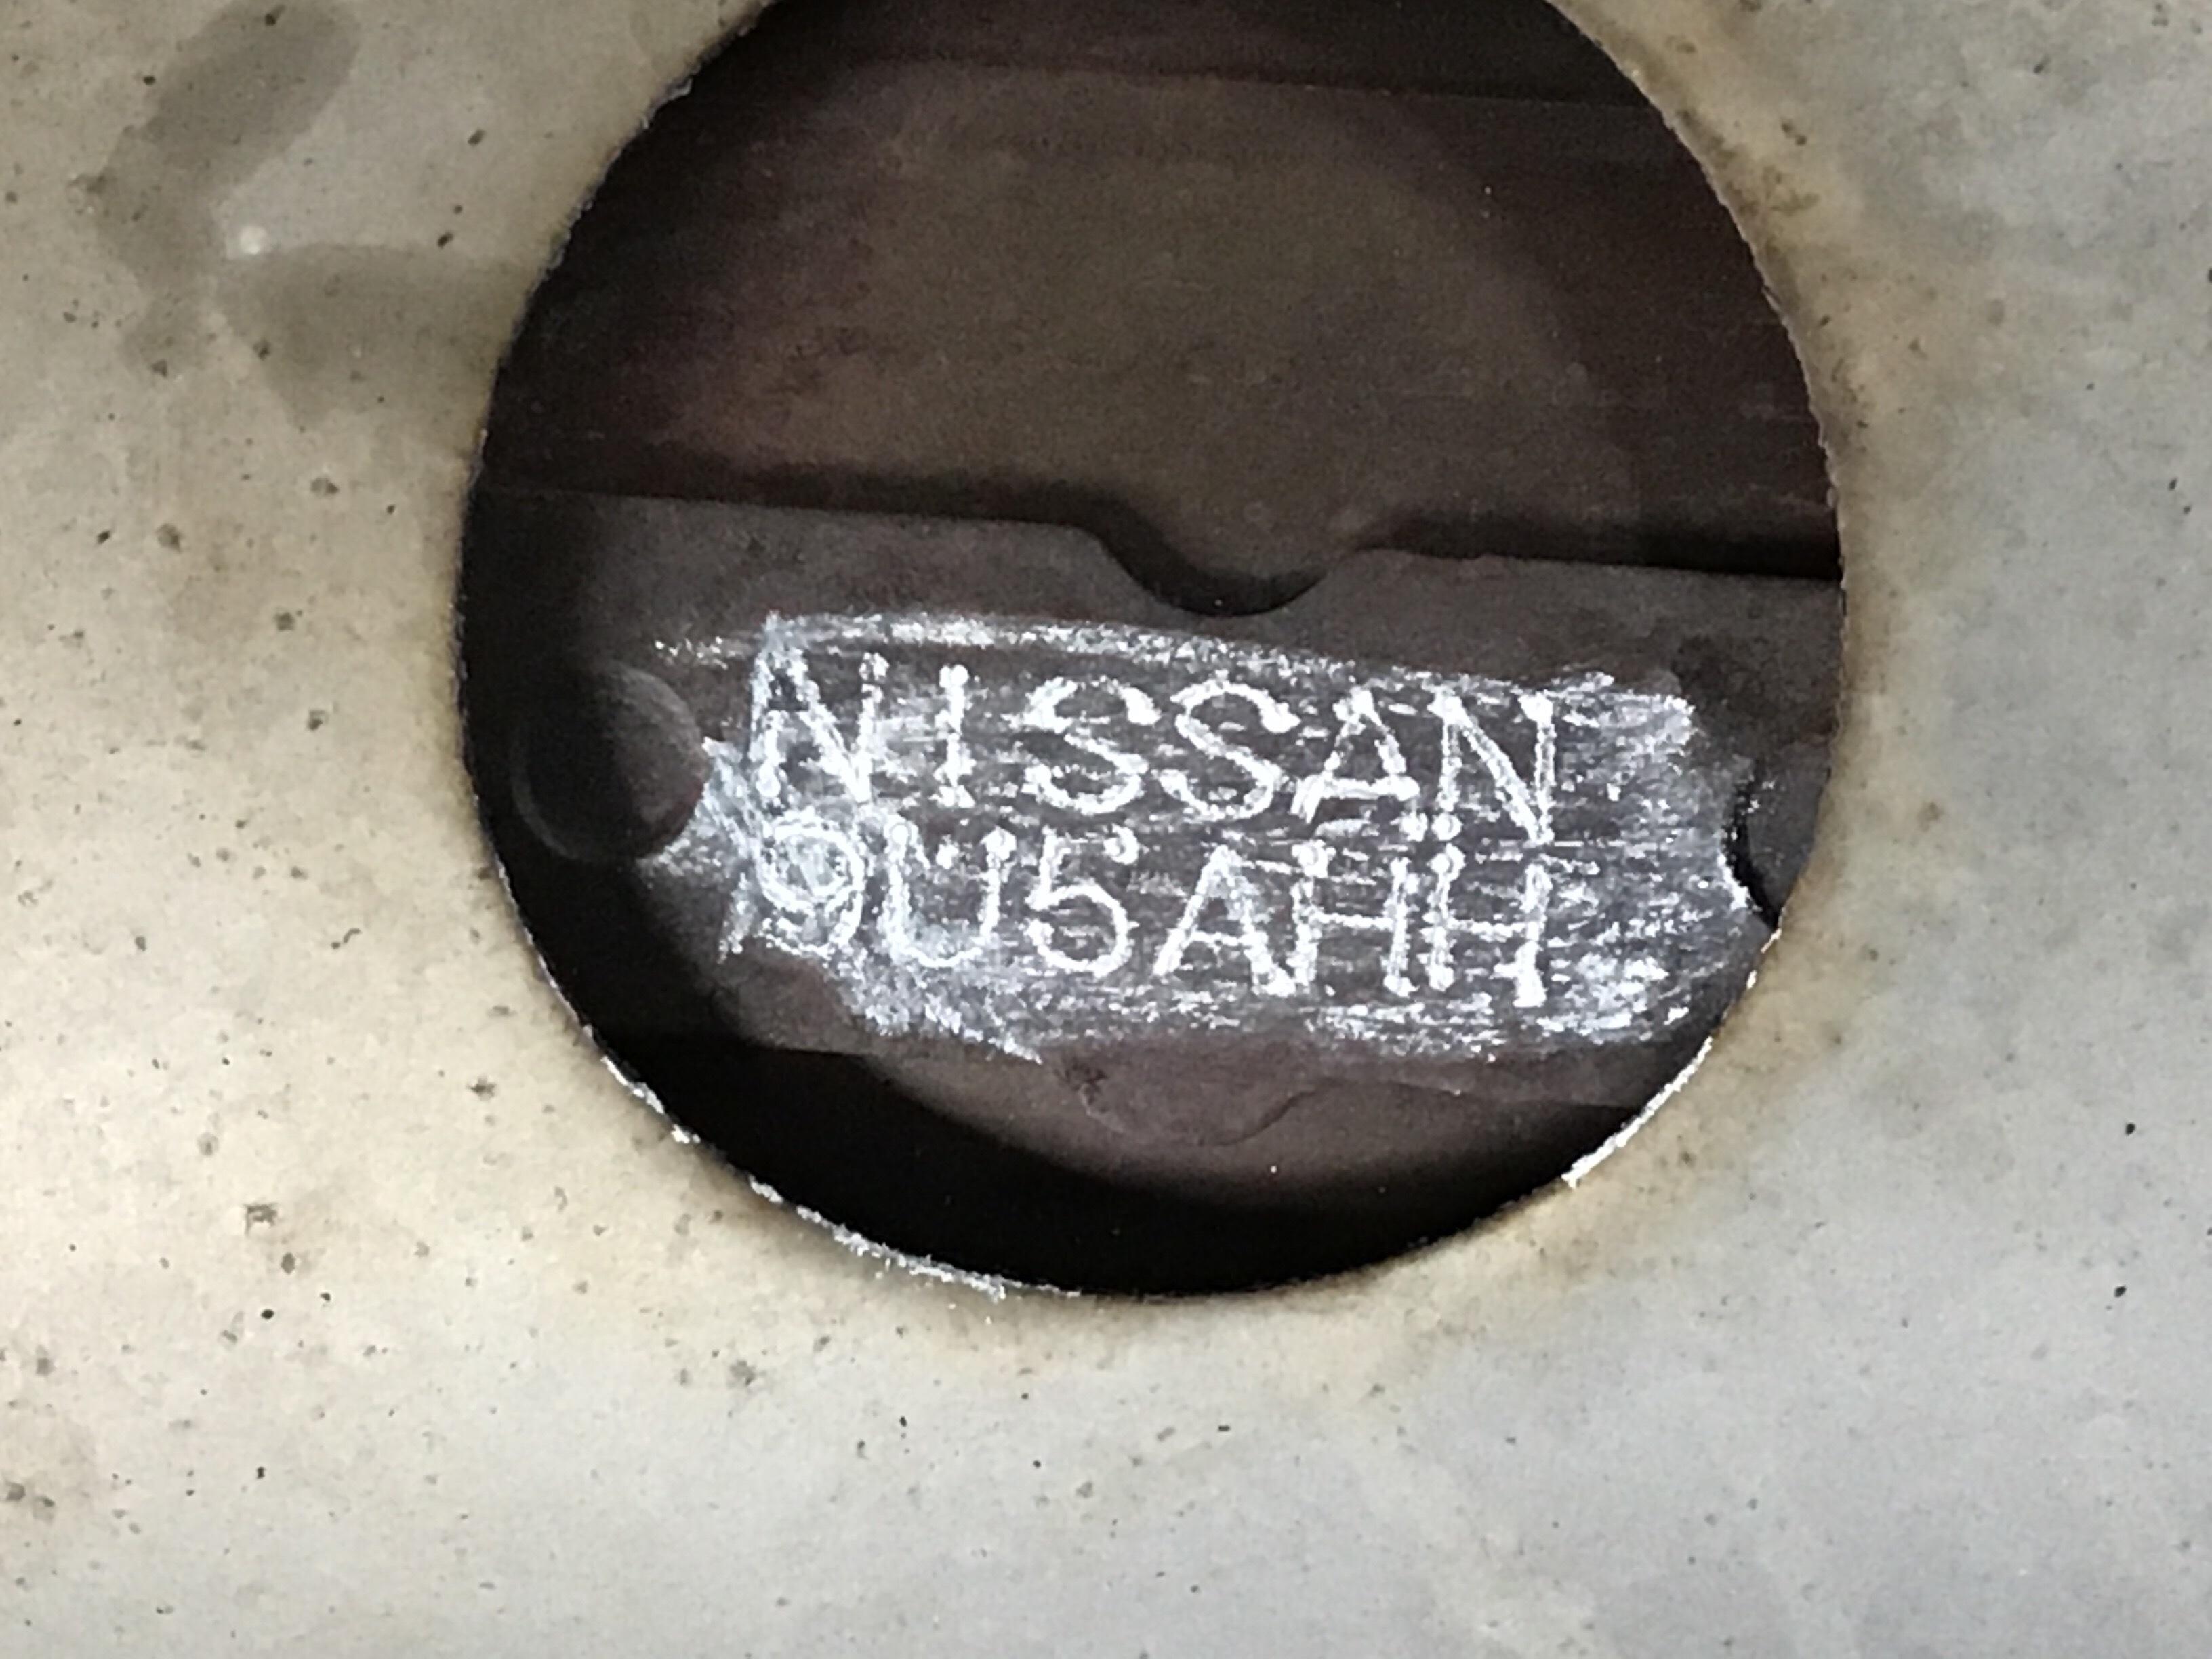 NISSAN Tiida   Ref:SP233051     11/19